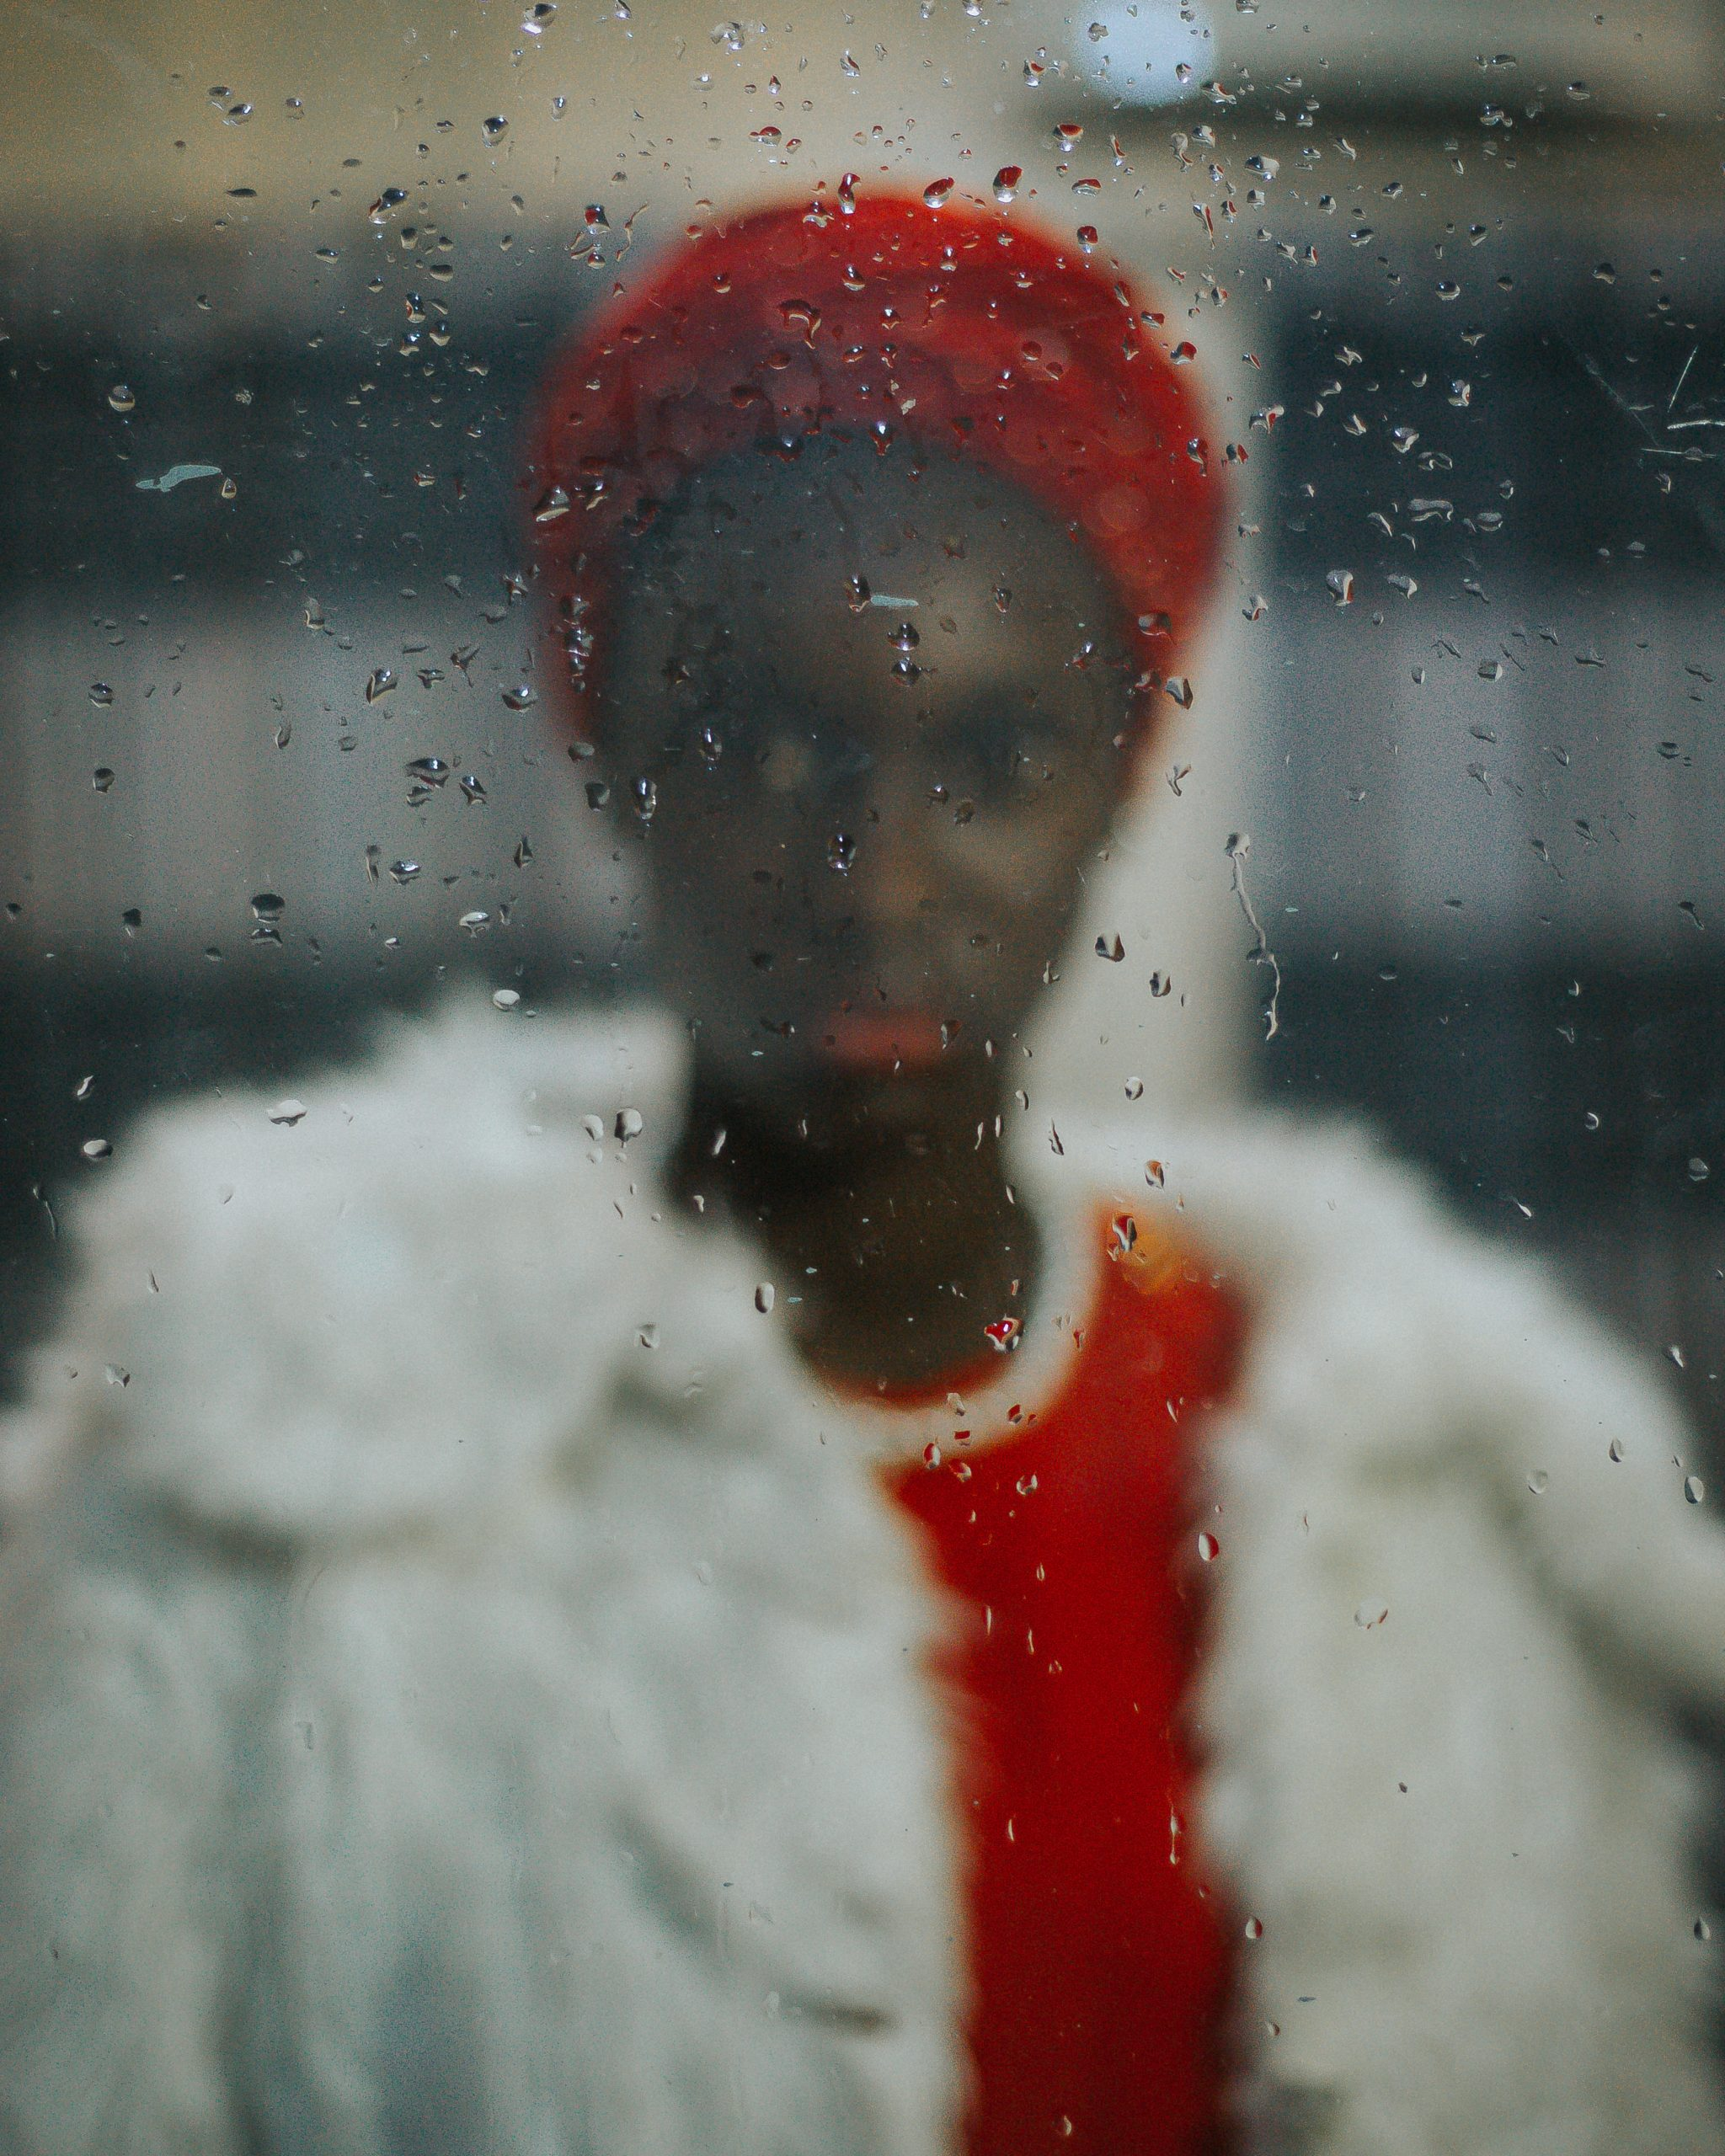 Open Call - fashion color portrait photograph of a woman